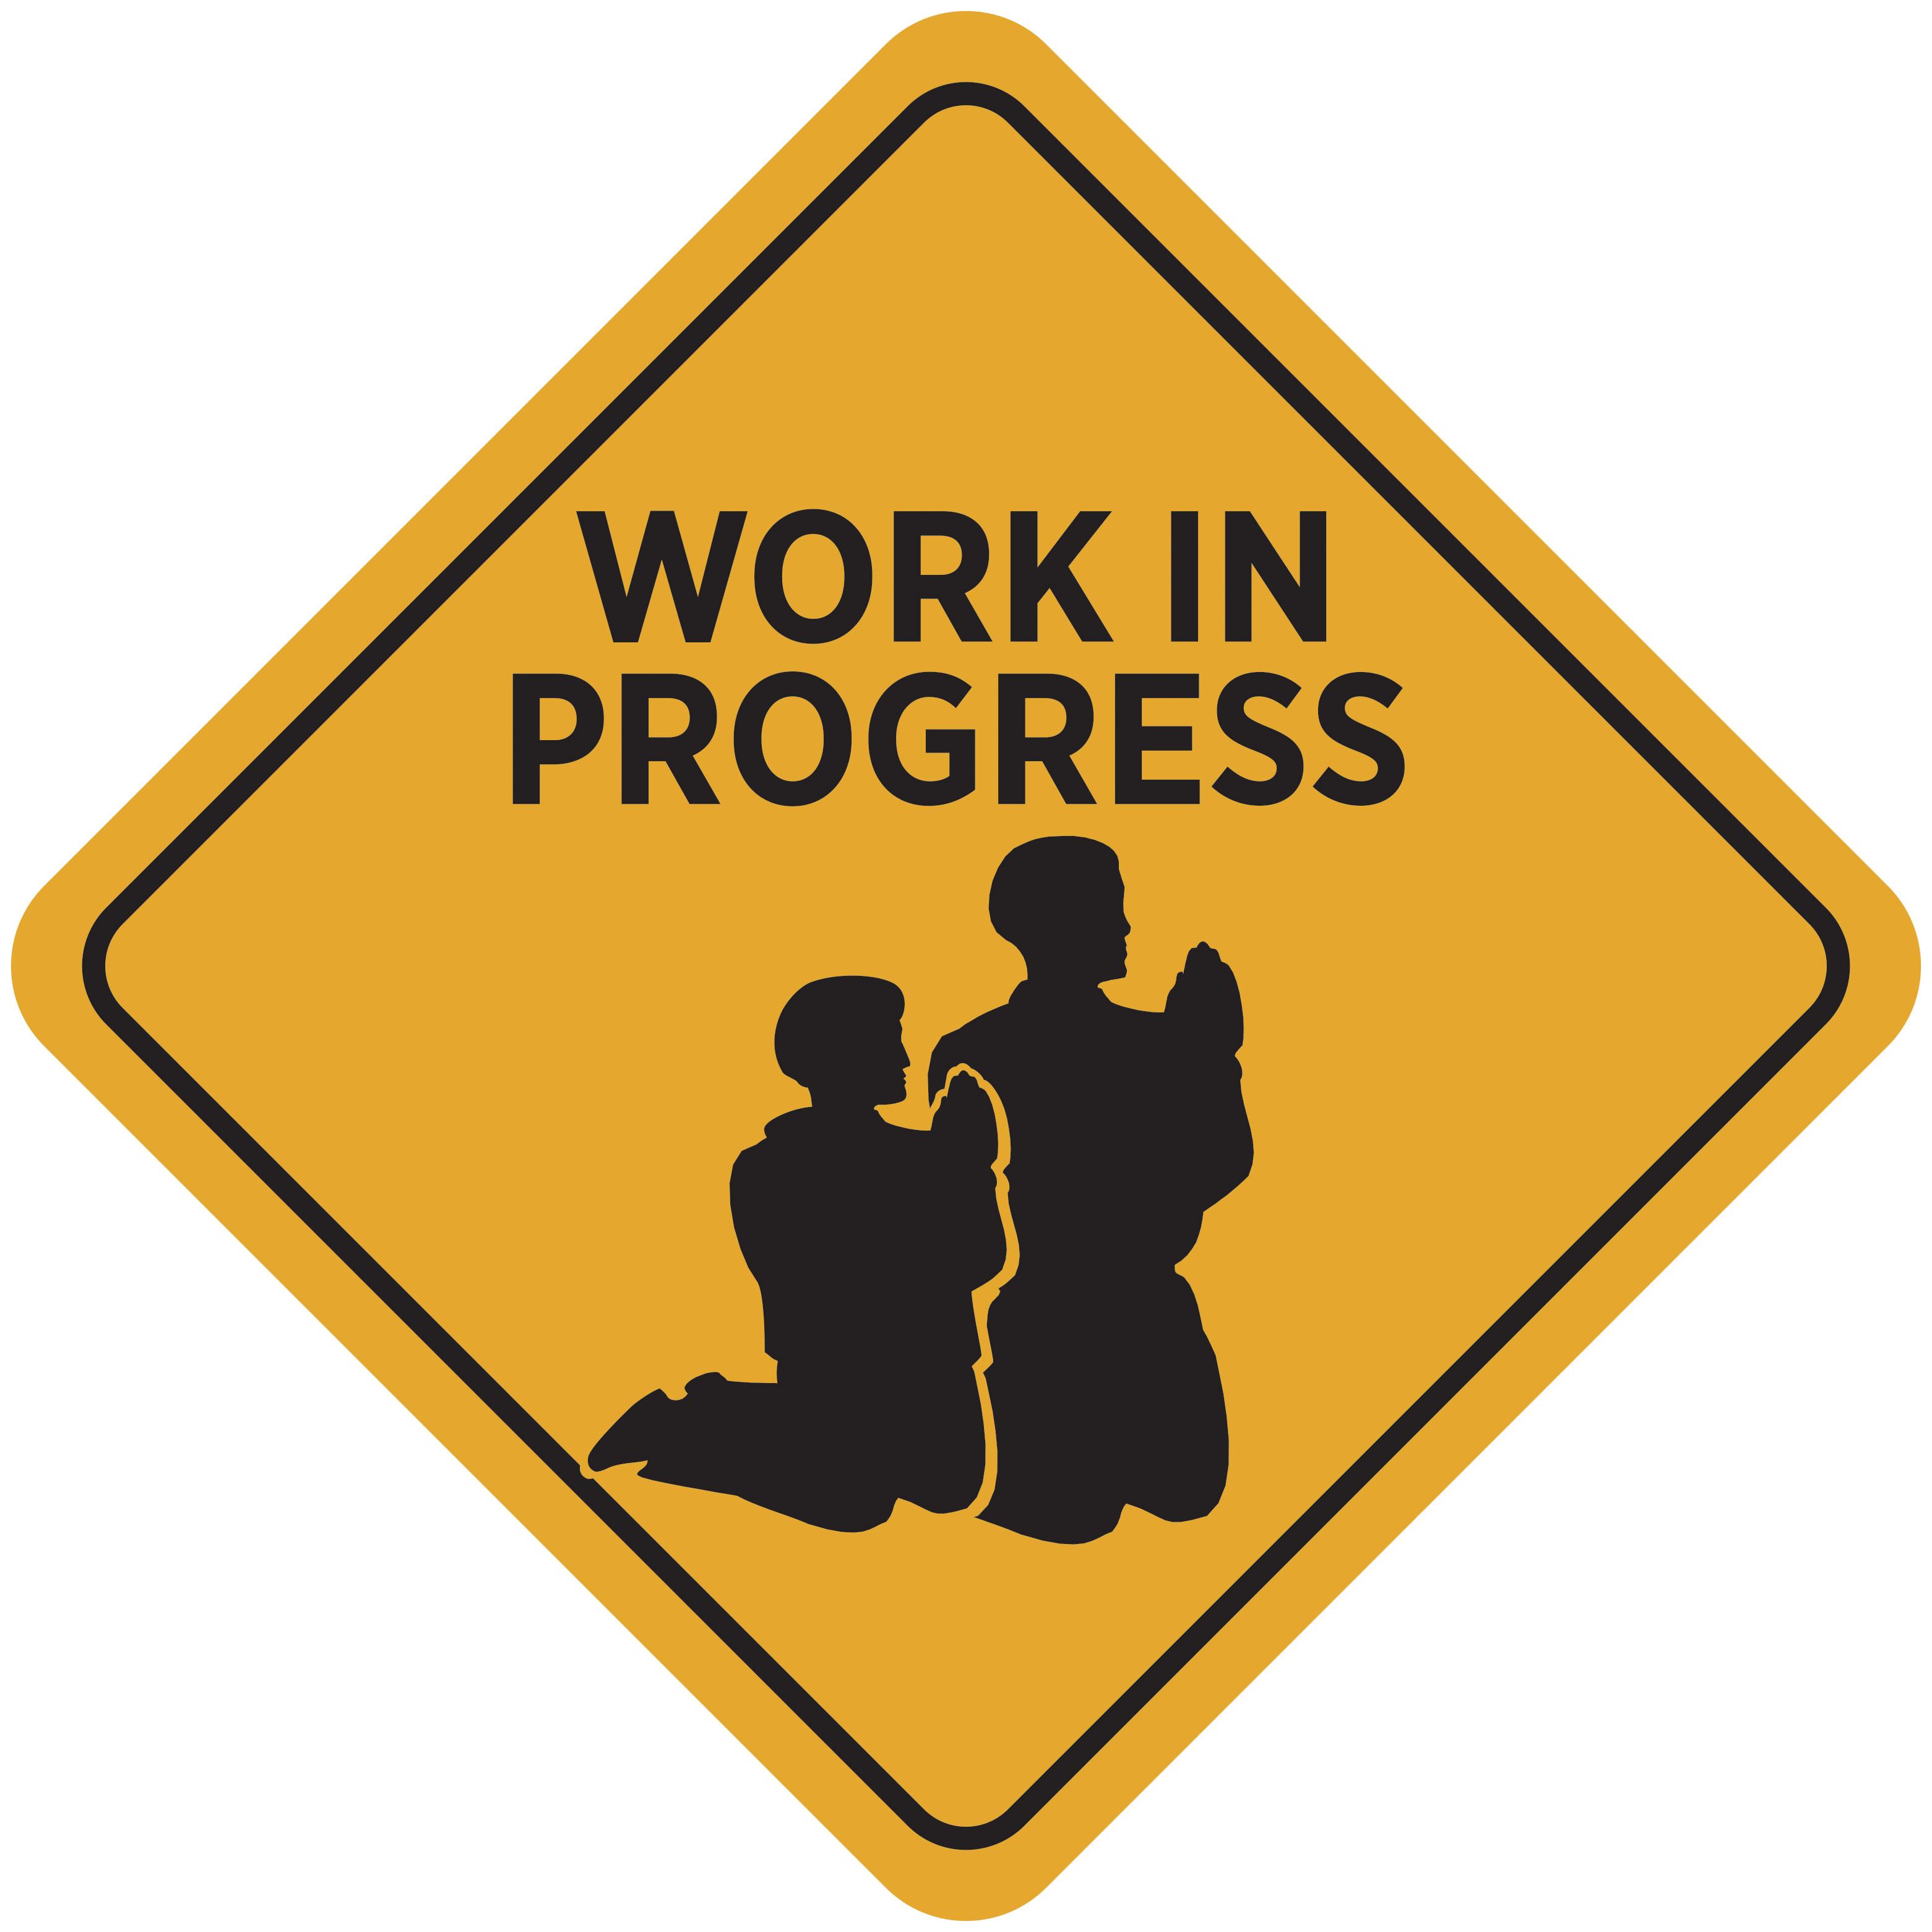 Work In Progress Clipart.